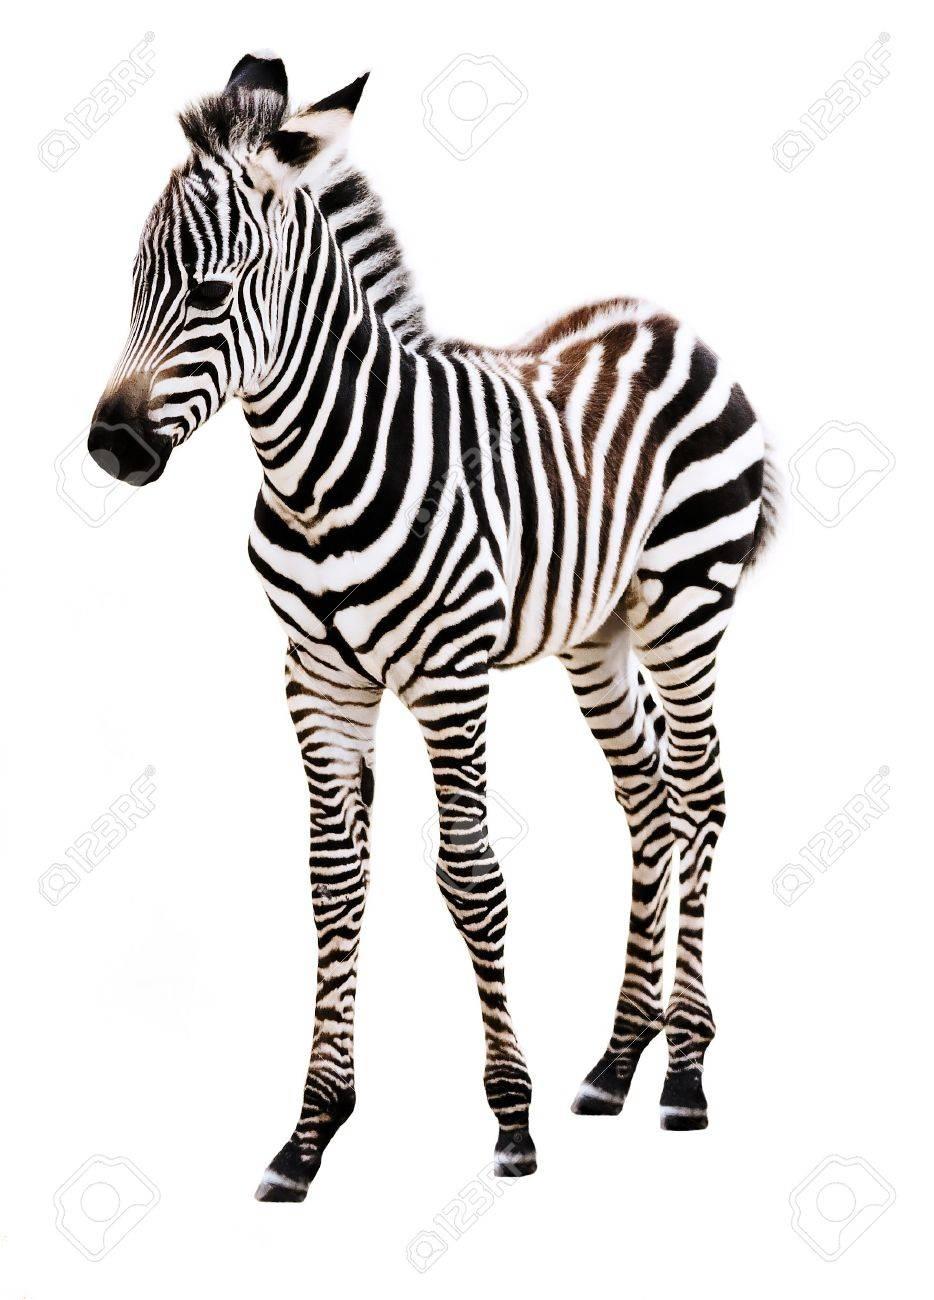 Adorable Zebra standing, on white background. Stock Photo - 5320765